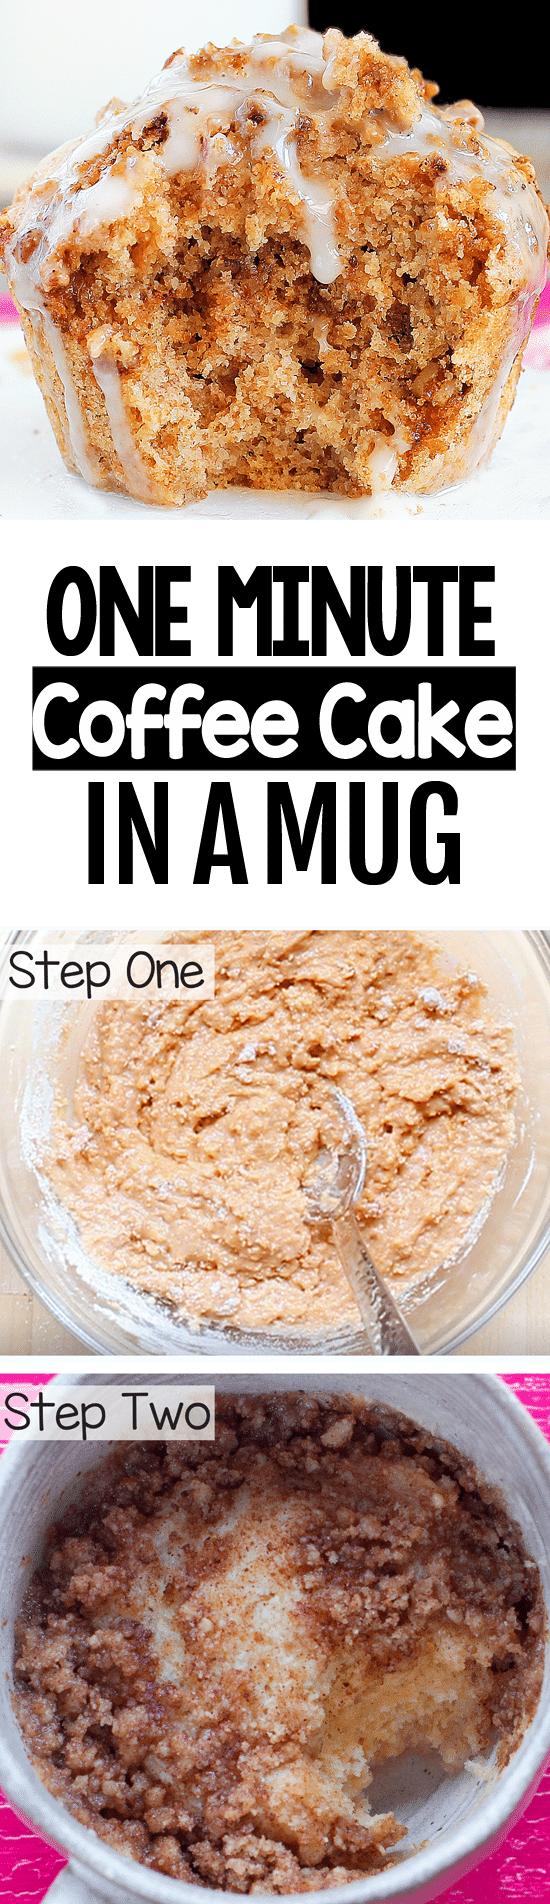 Easy One Minute Coffee Mug Cake (Vegan, Keto Option)